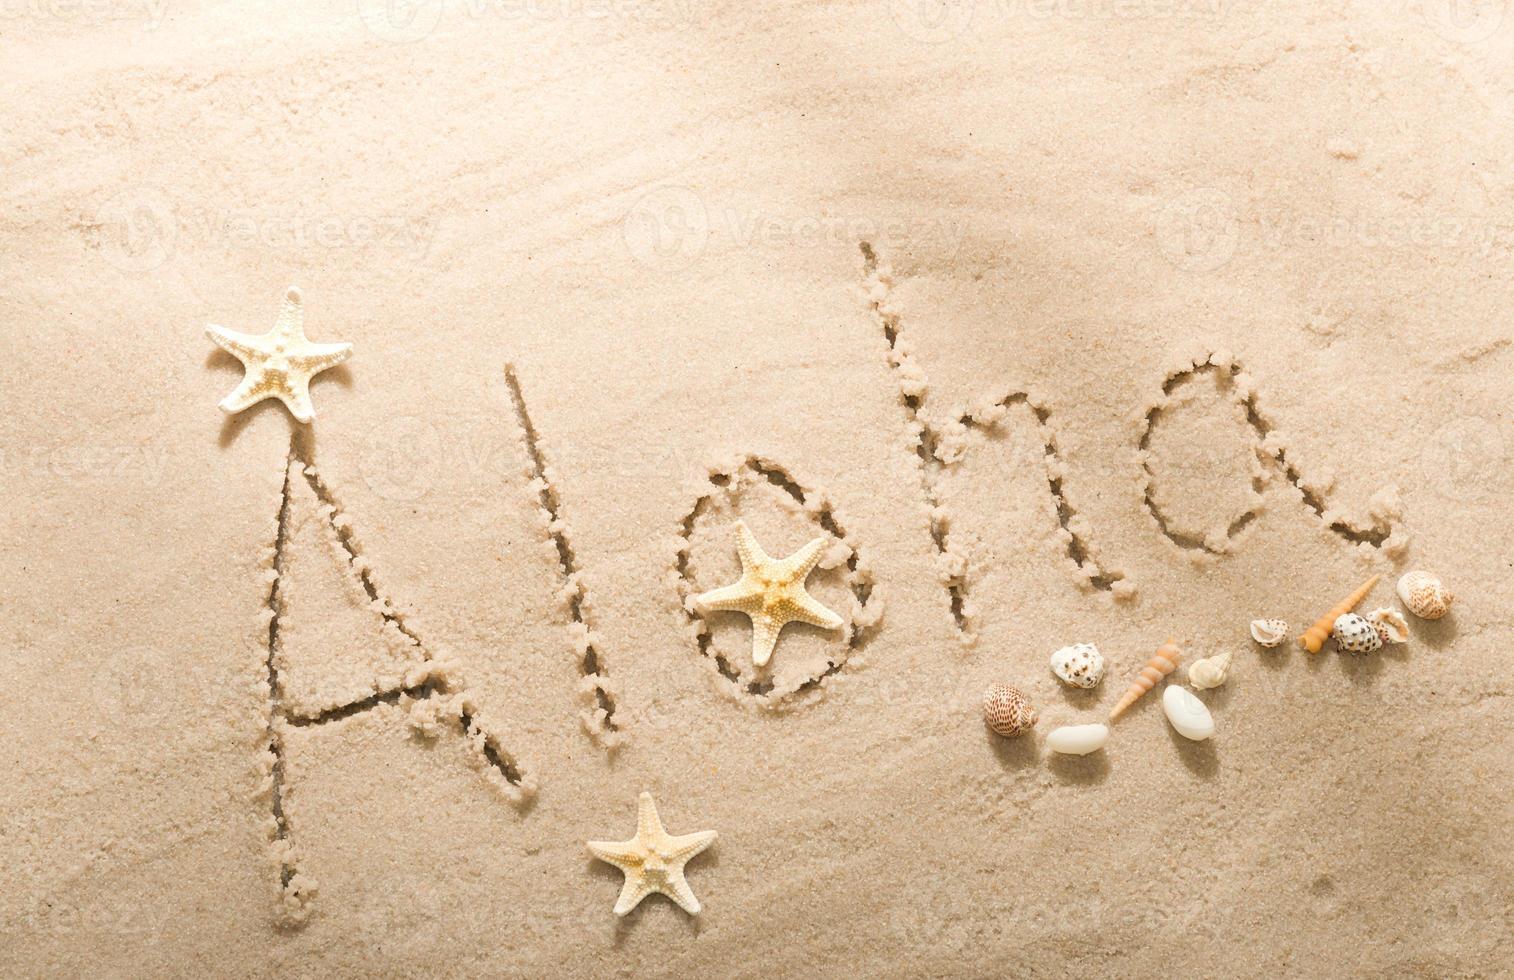 Aloha beach writing with seashells photo